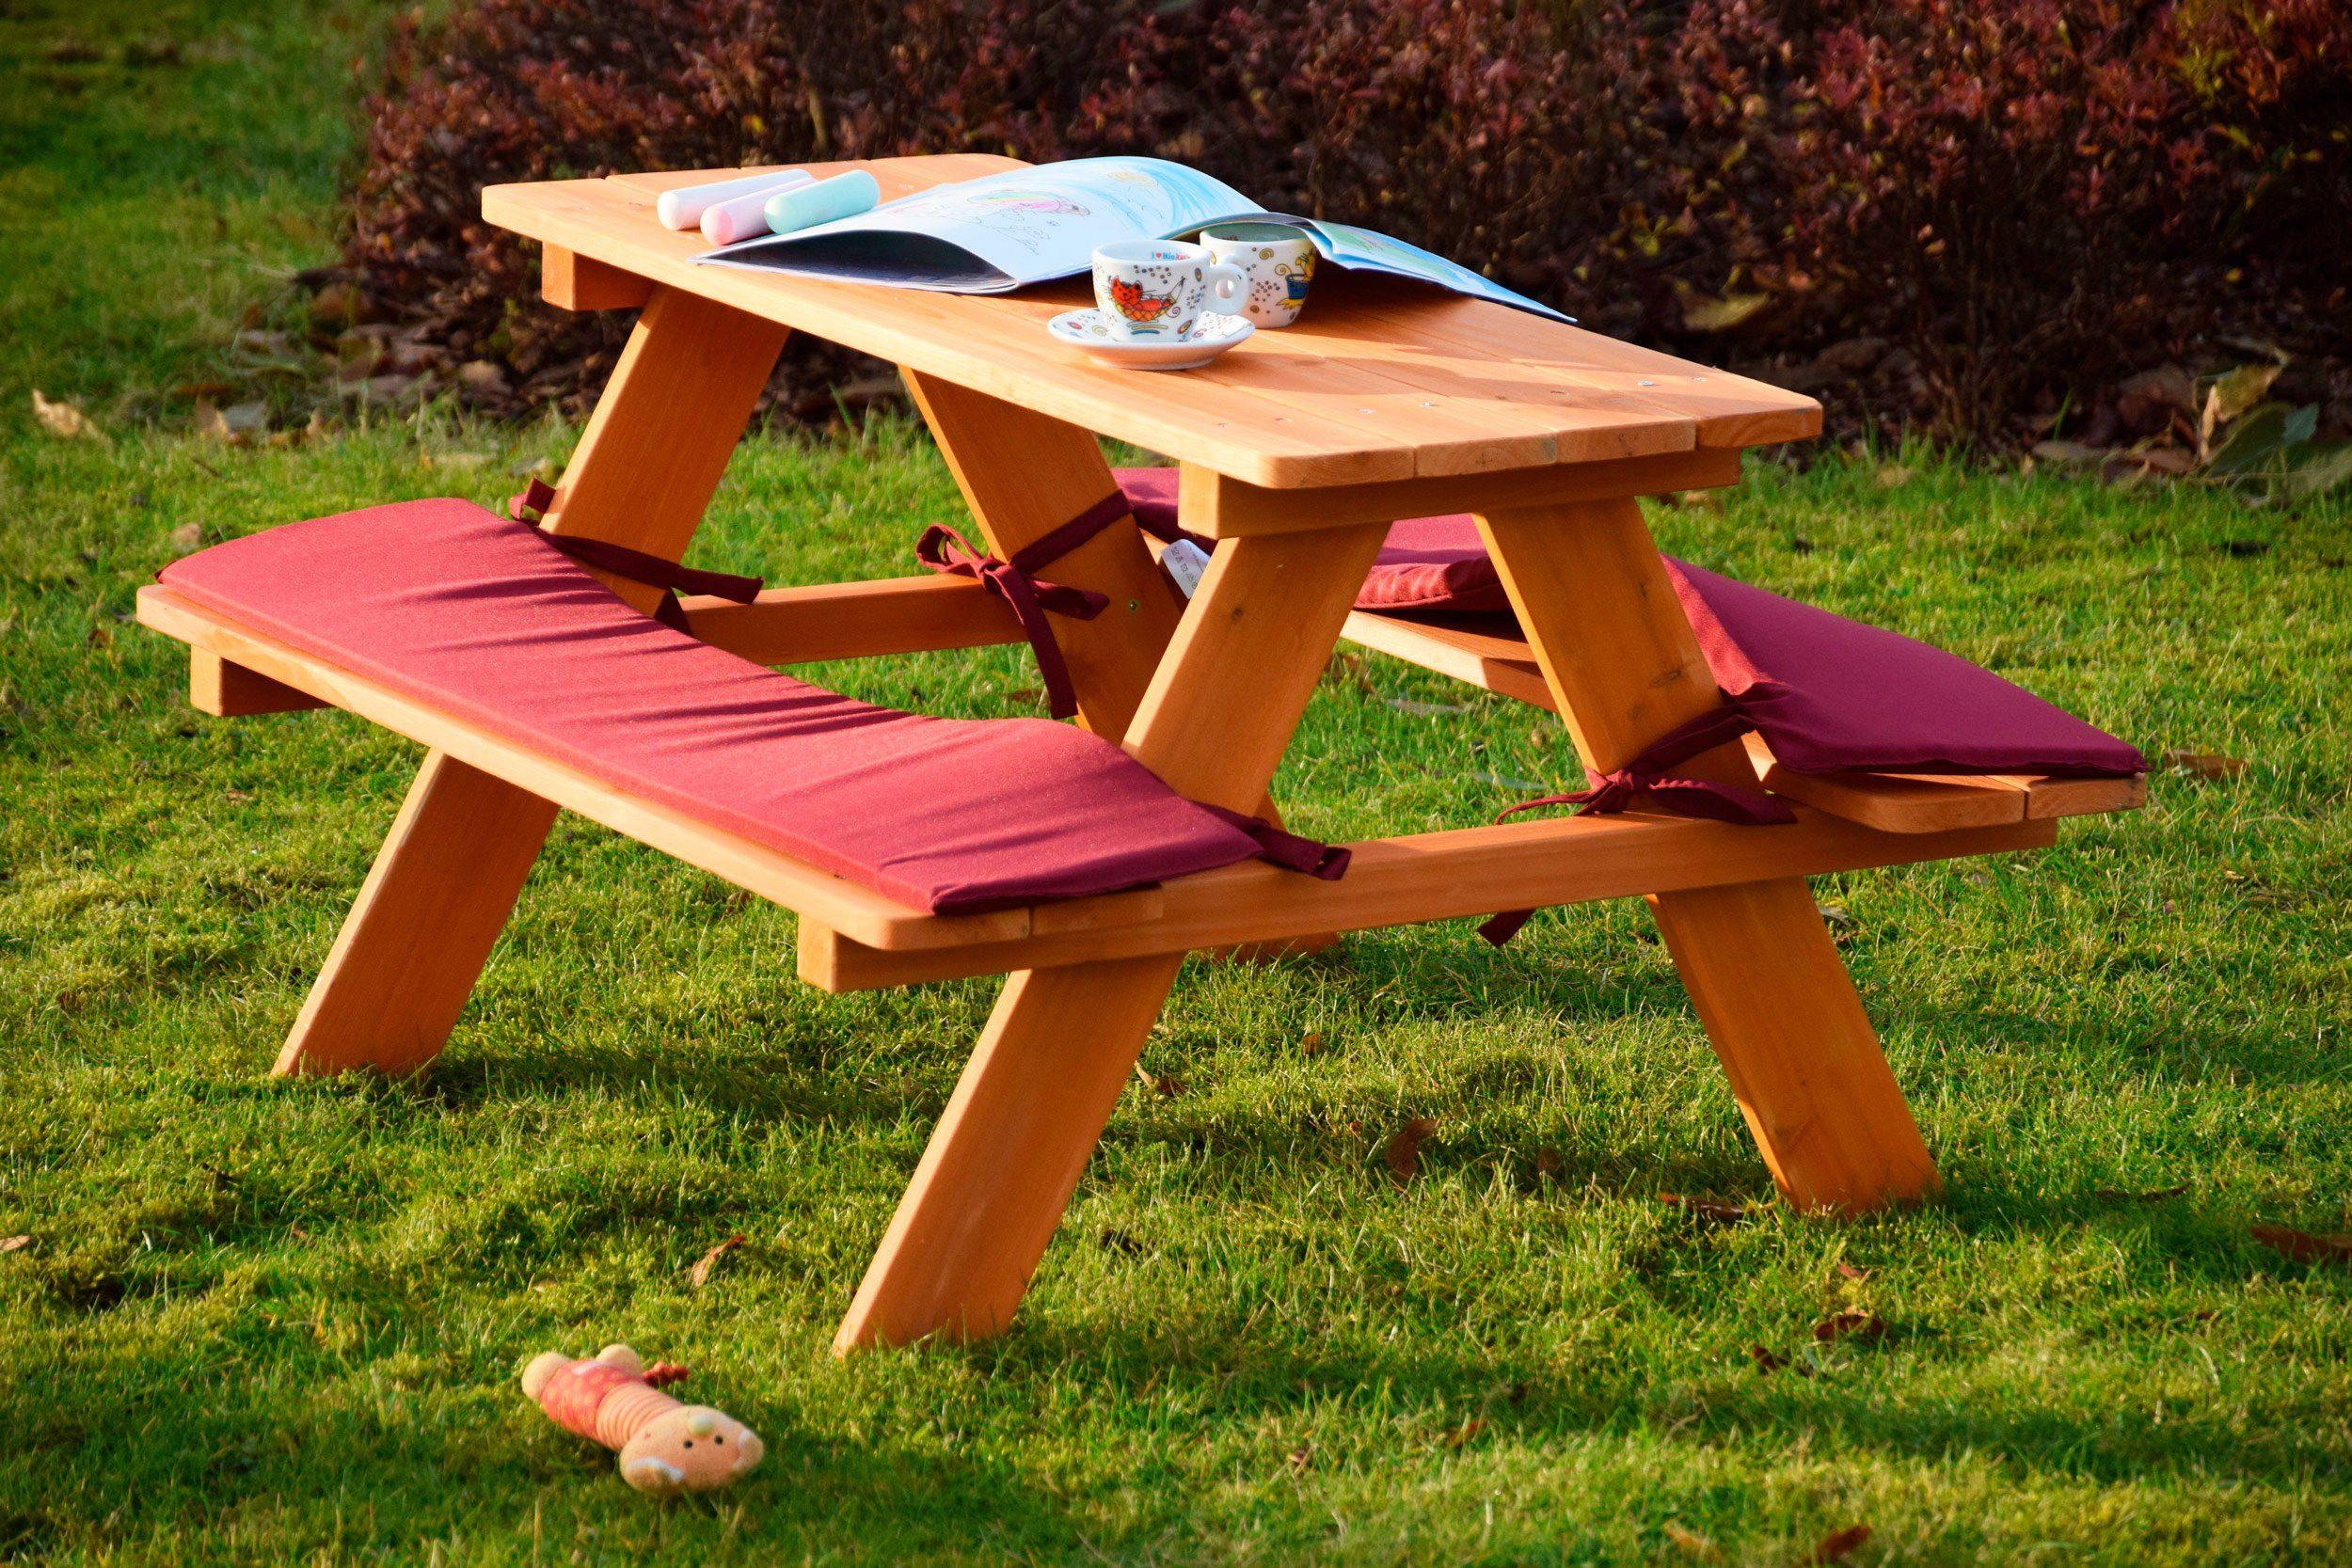 Kinder Picknick Tafel : Aangeboden kinder picknick tafel met parasol